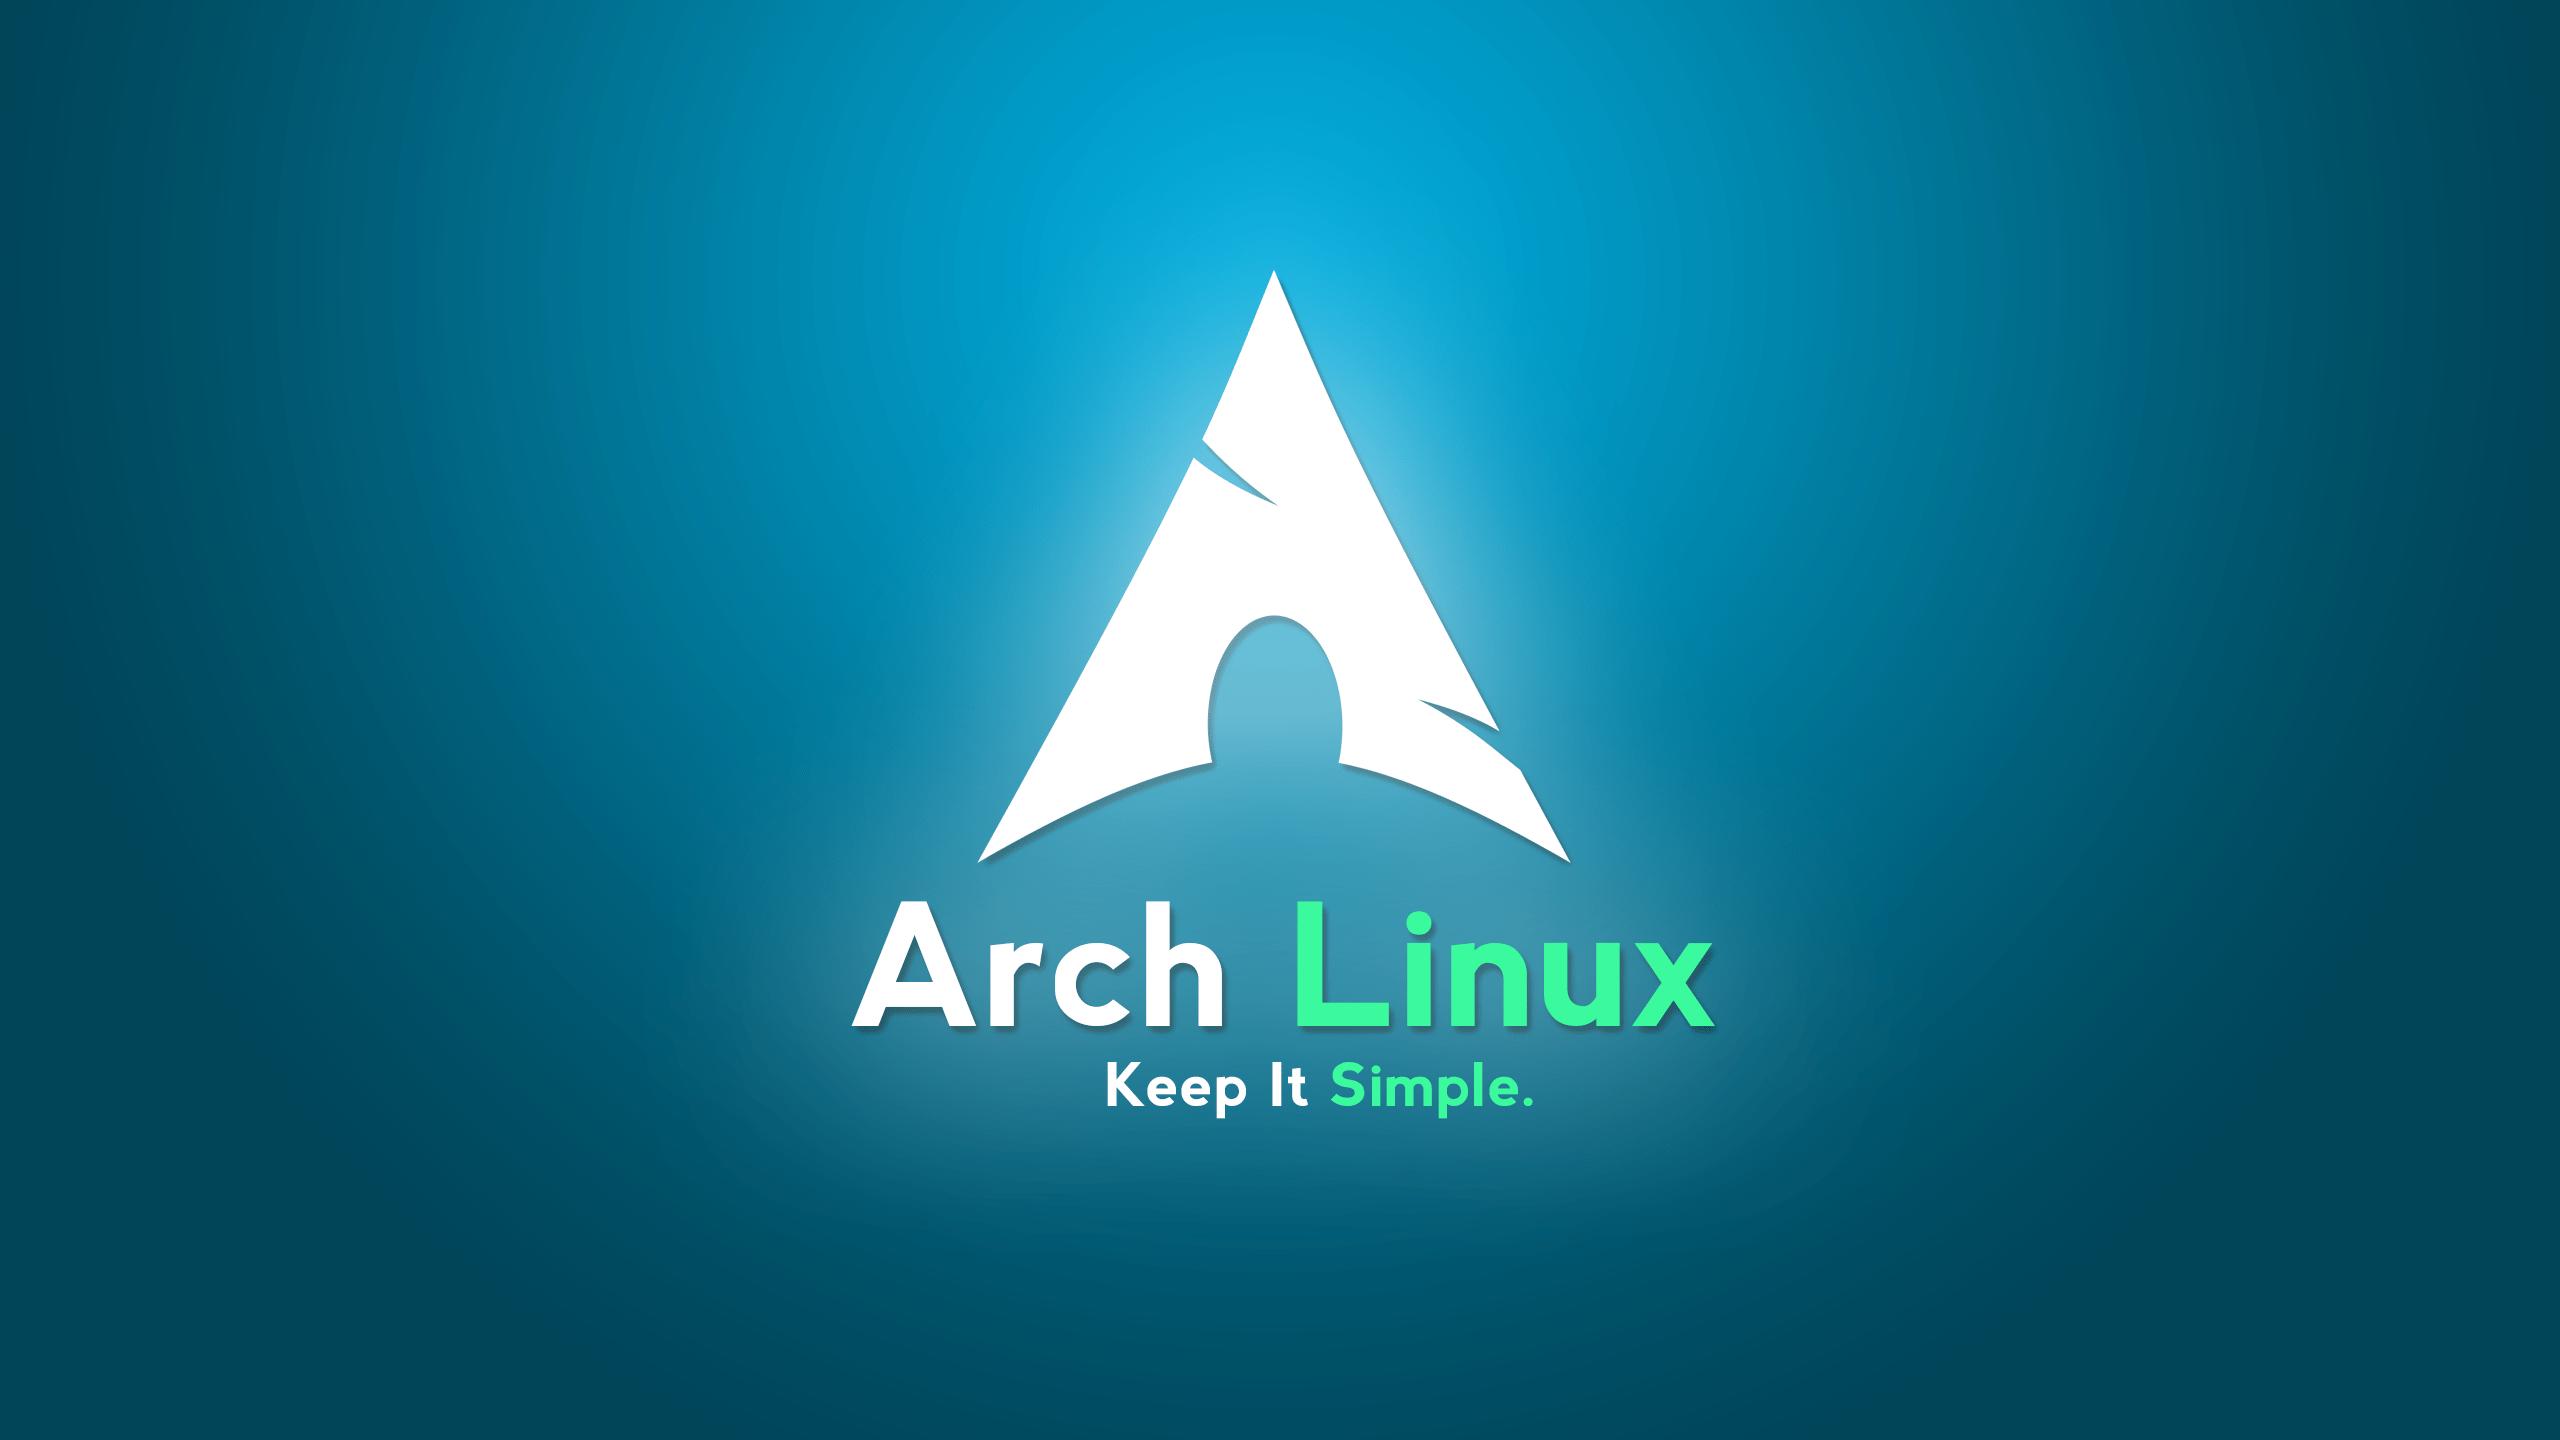 Пошаговое руководство по установке дистрибутива Arch Linux